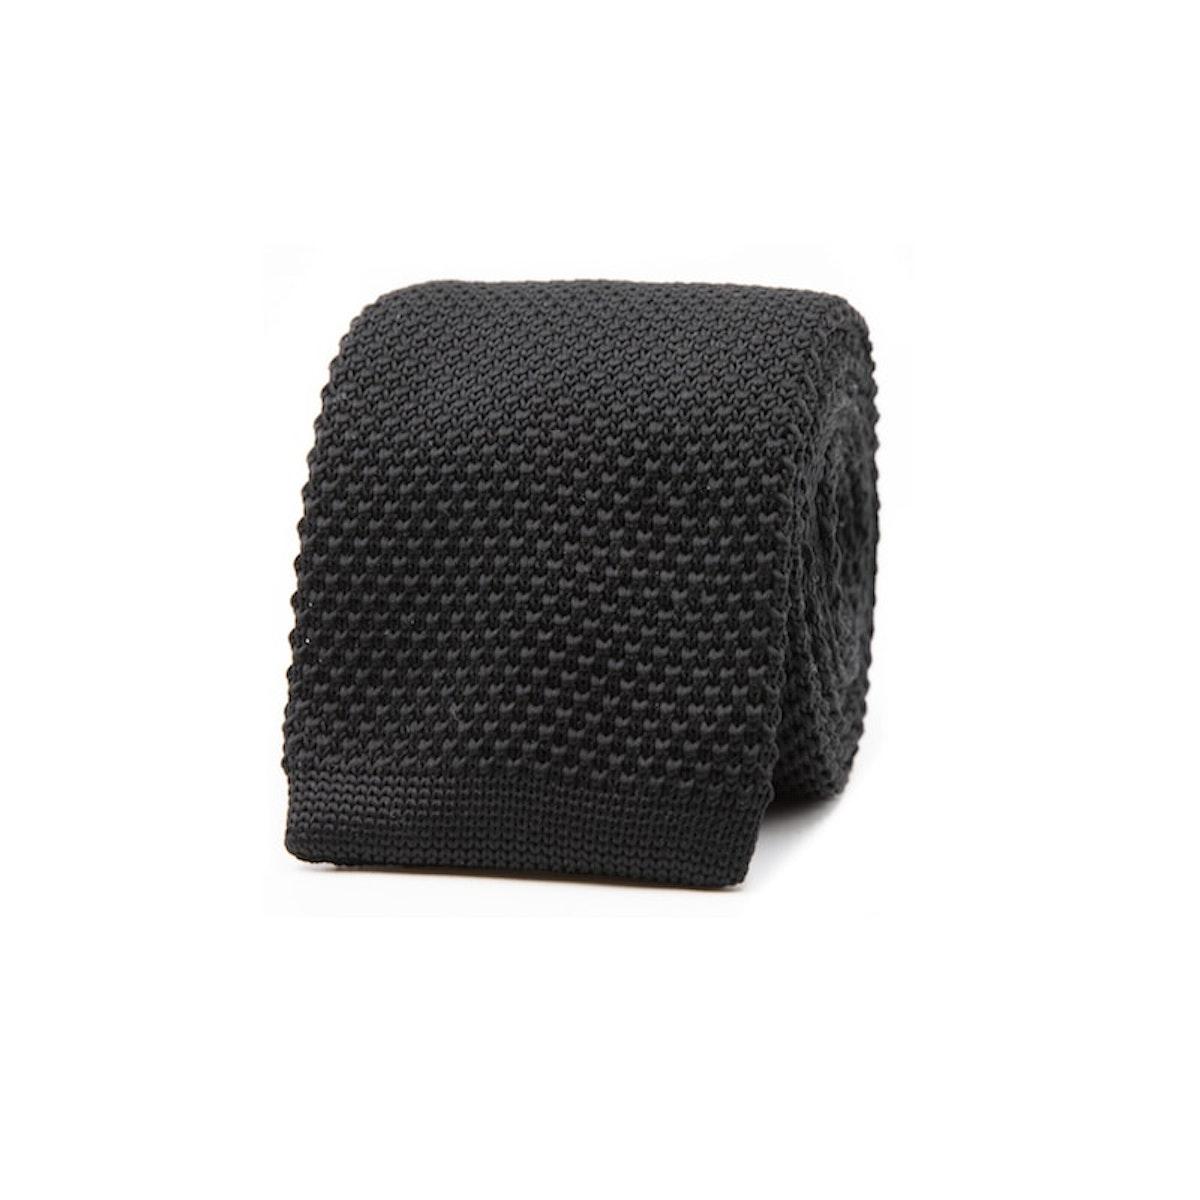 InStitchu Essentials Accessories Tie Kutti Black Knitted Square-End Tie